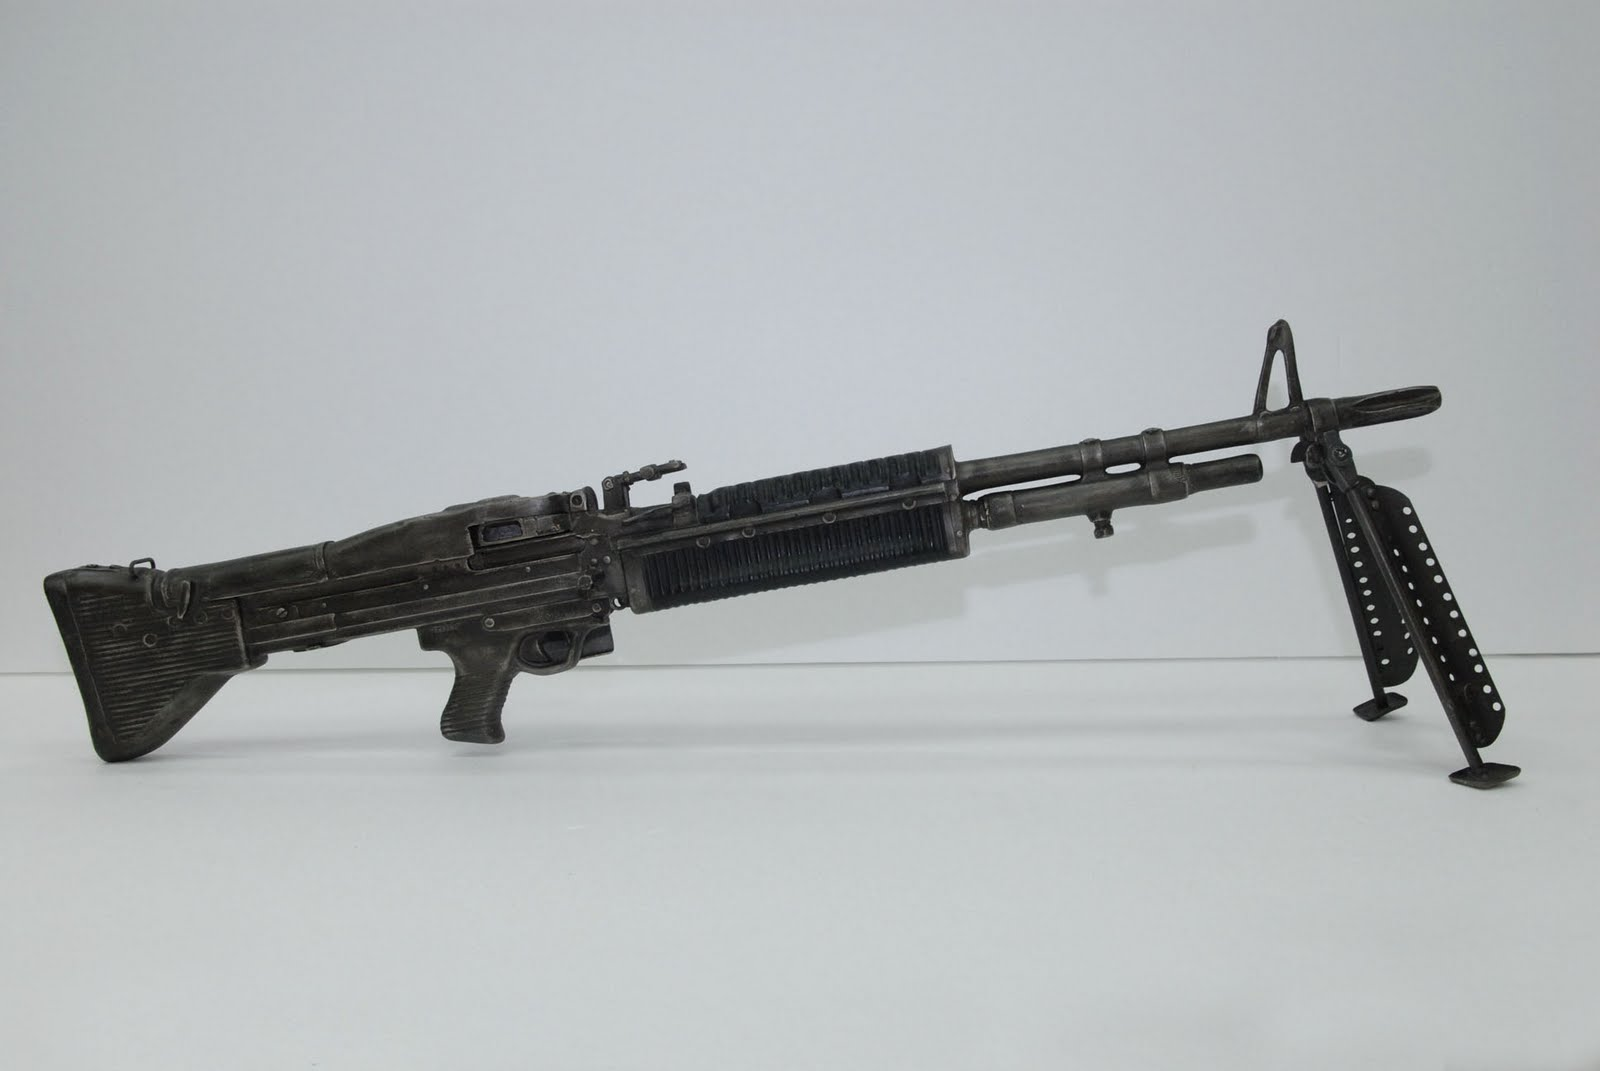 m60 machine gun - photo #5